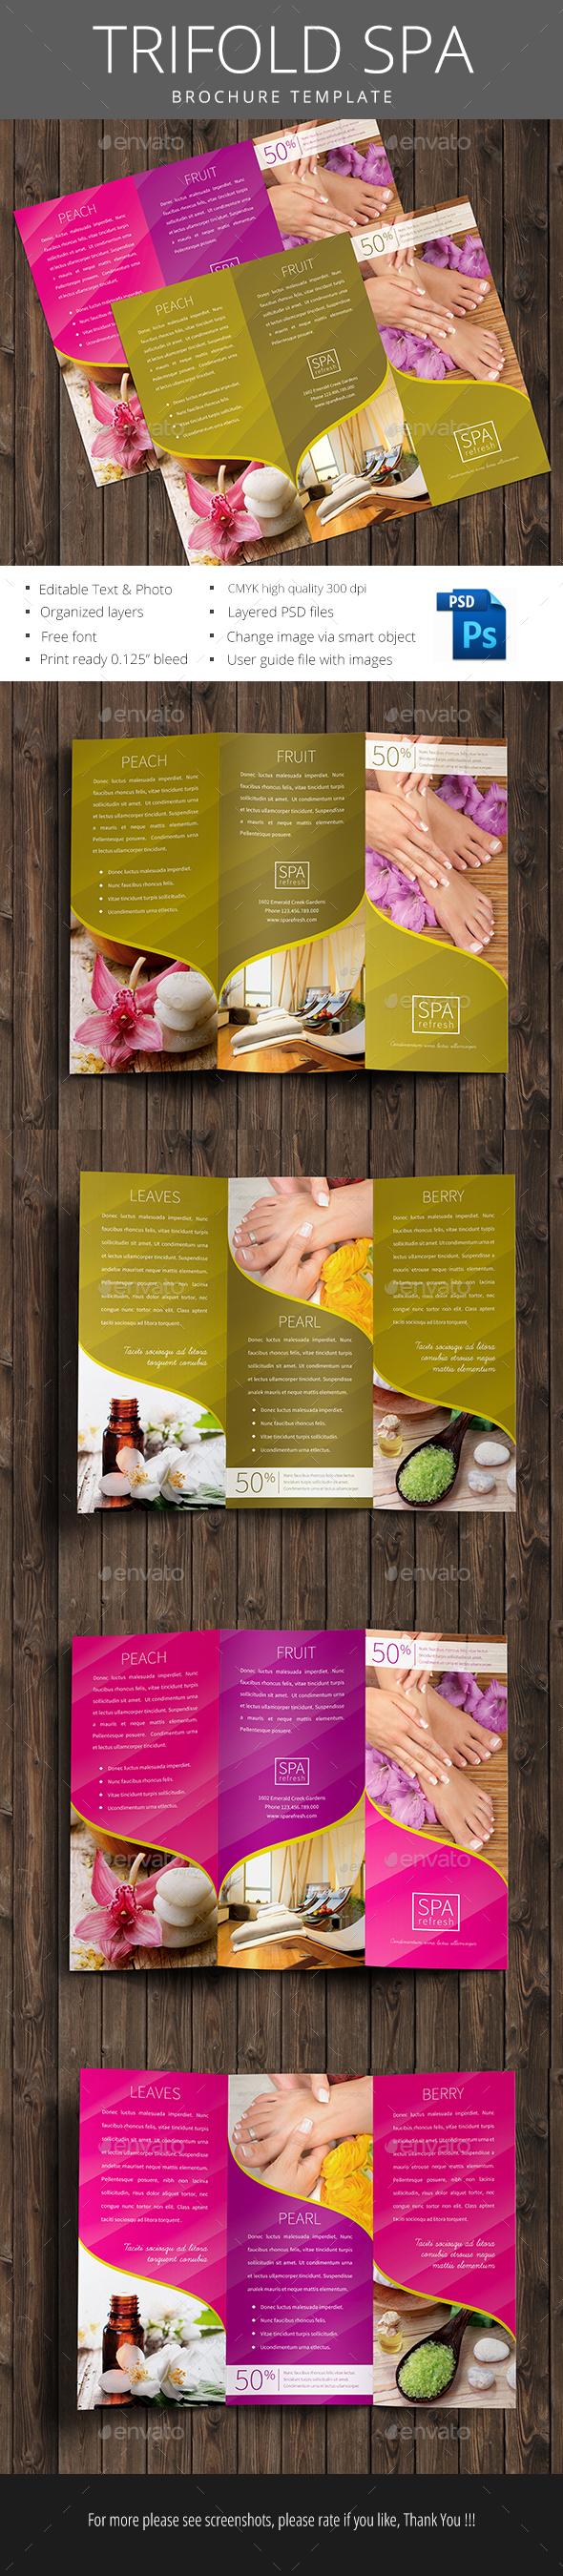 Spa Trifold Brochure - Brochures Print Templates